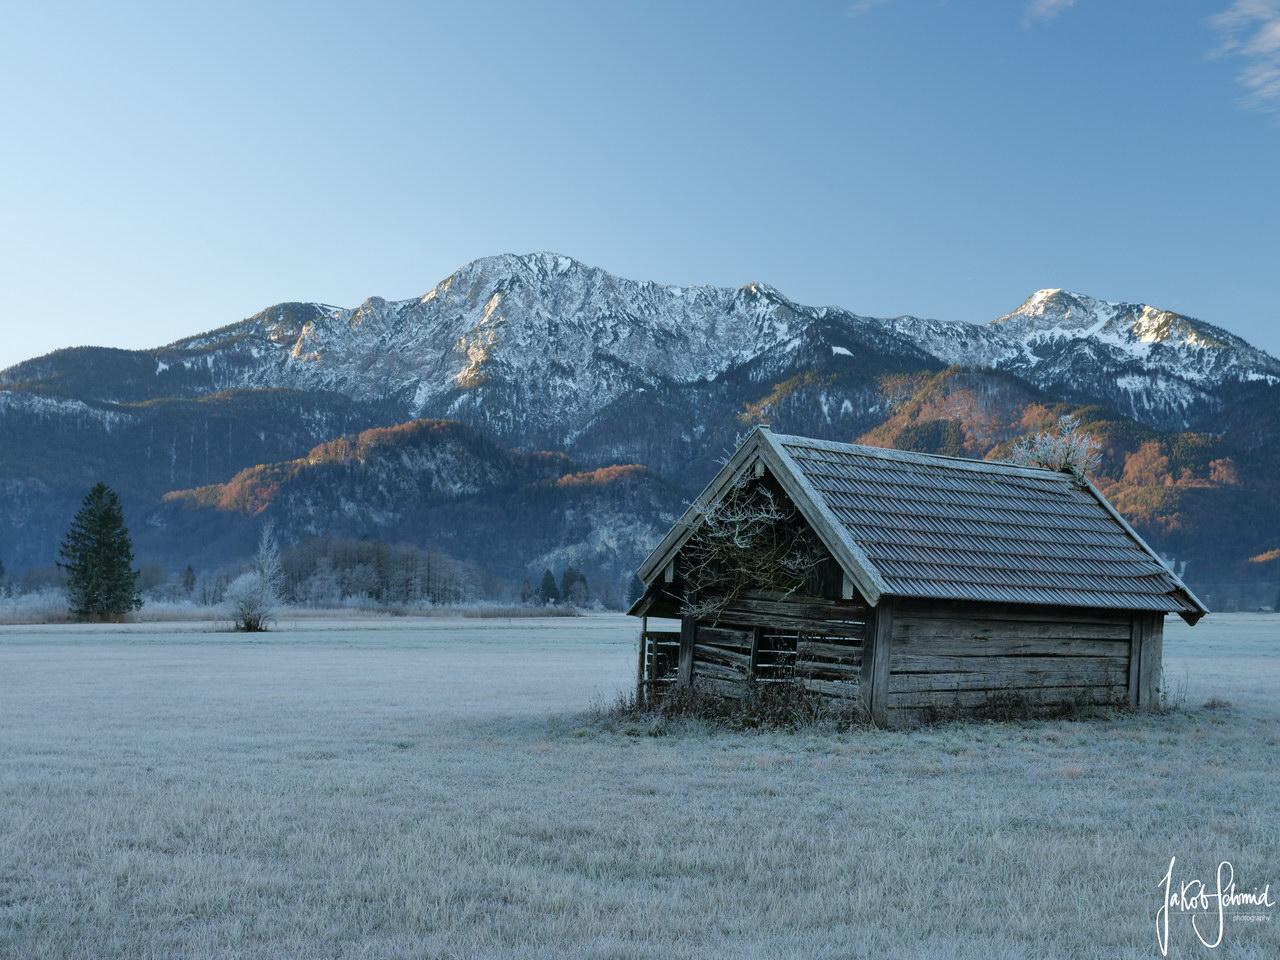 Kochel Winter Hütte Herzogstand